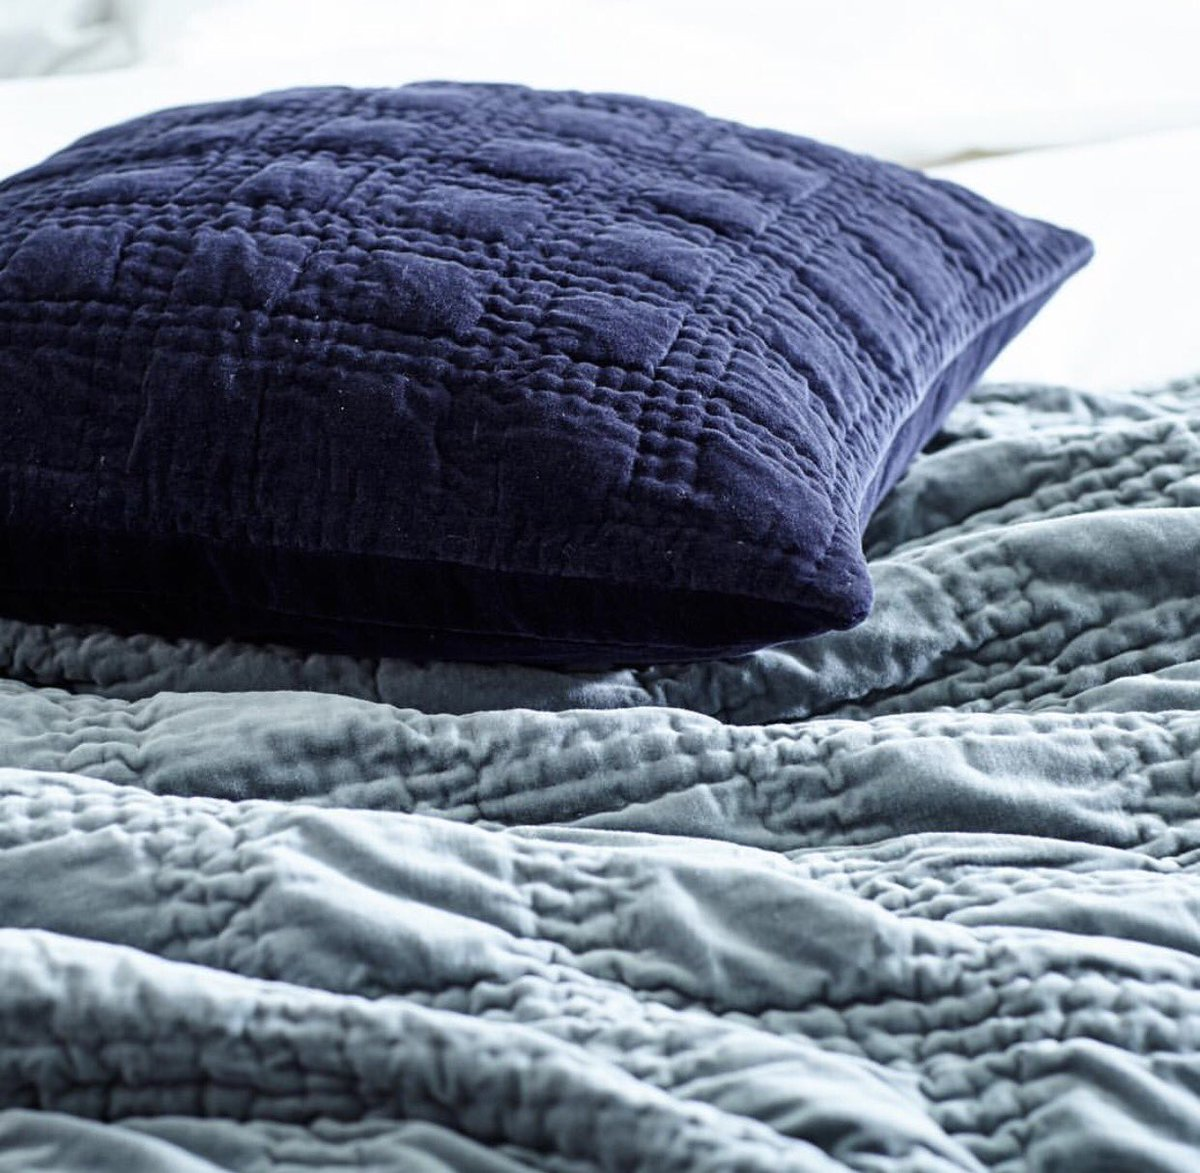 urbanara urbanara twitter. Black Bedroom Furniture Sets. Home Design Ideas